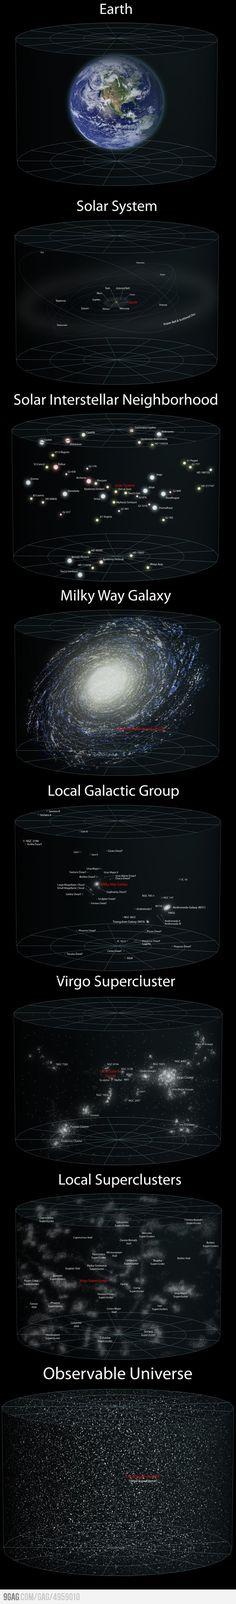 echelle cosmique